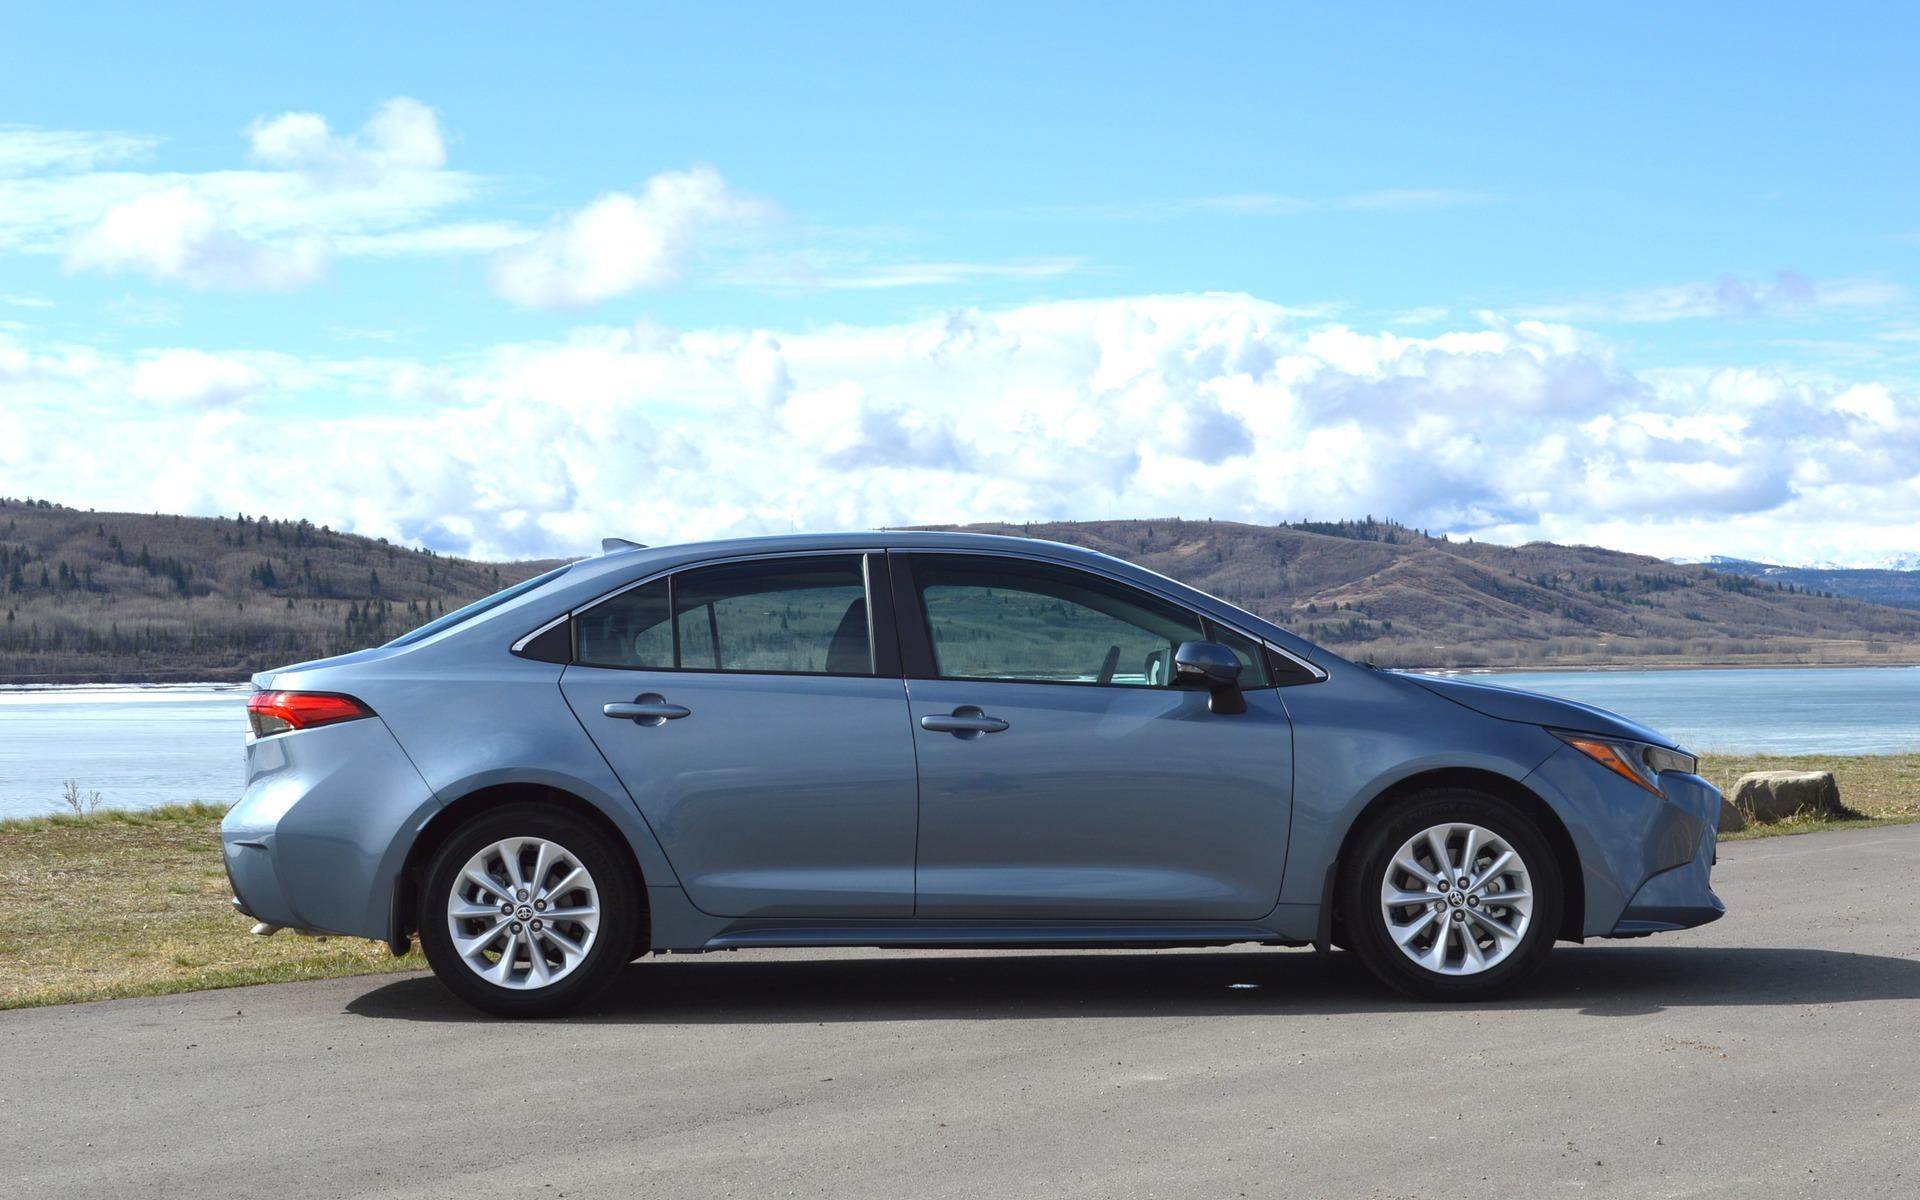 Toyota Corolla 2020: La Corolla beige n'existe plus. Ou presque… 376899_Toyota_Corolla_2020_La_Corolla_beige_n_existe_plus_En_fait_presque